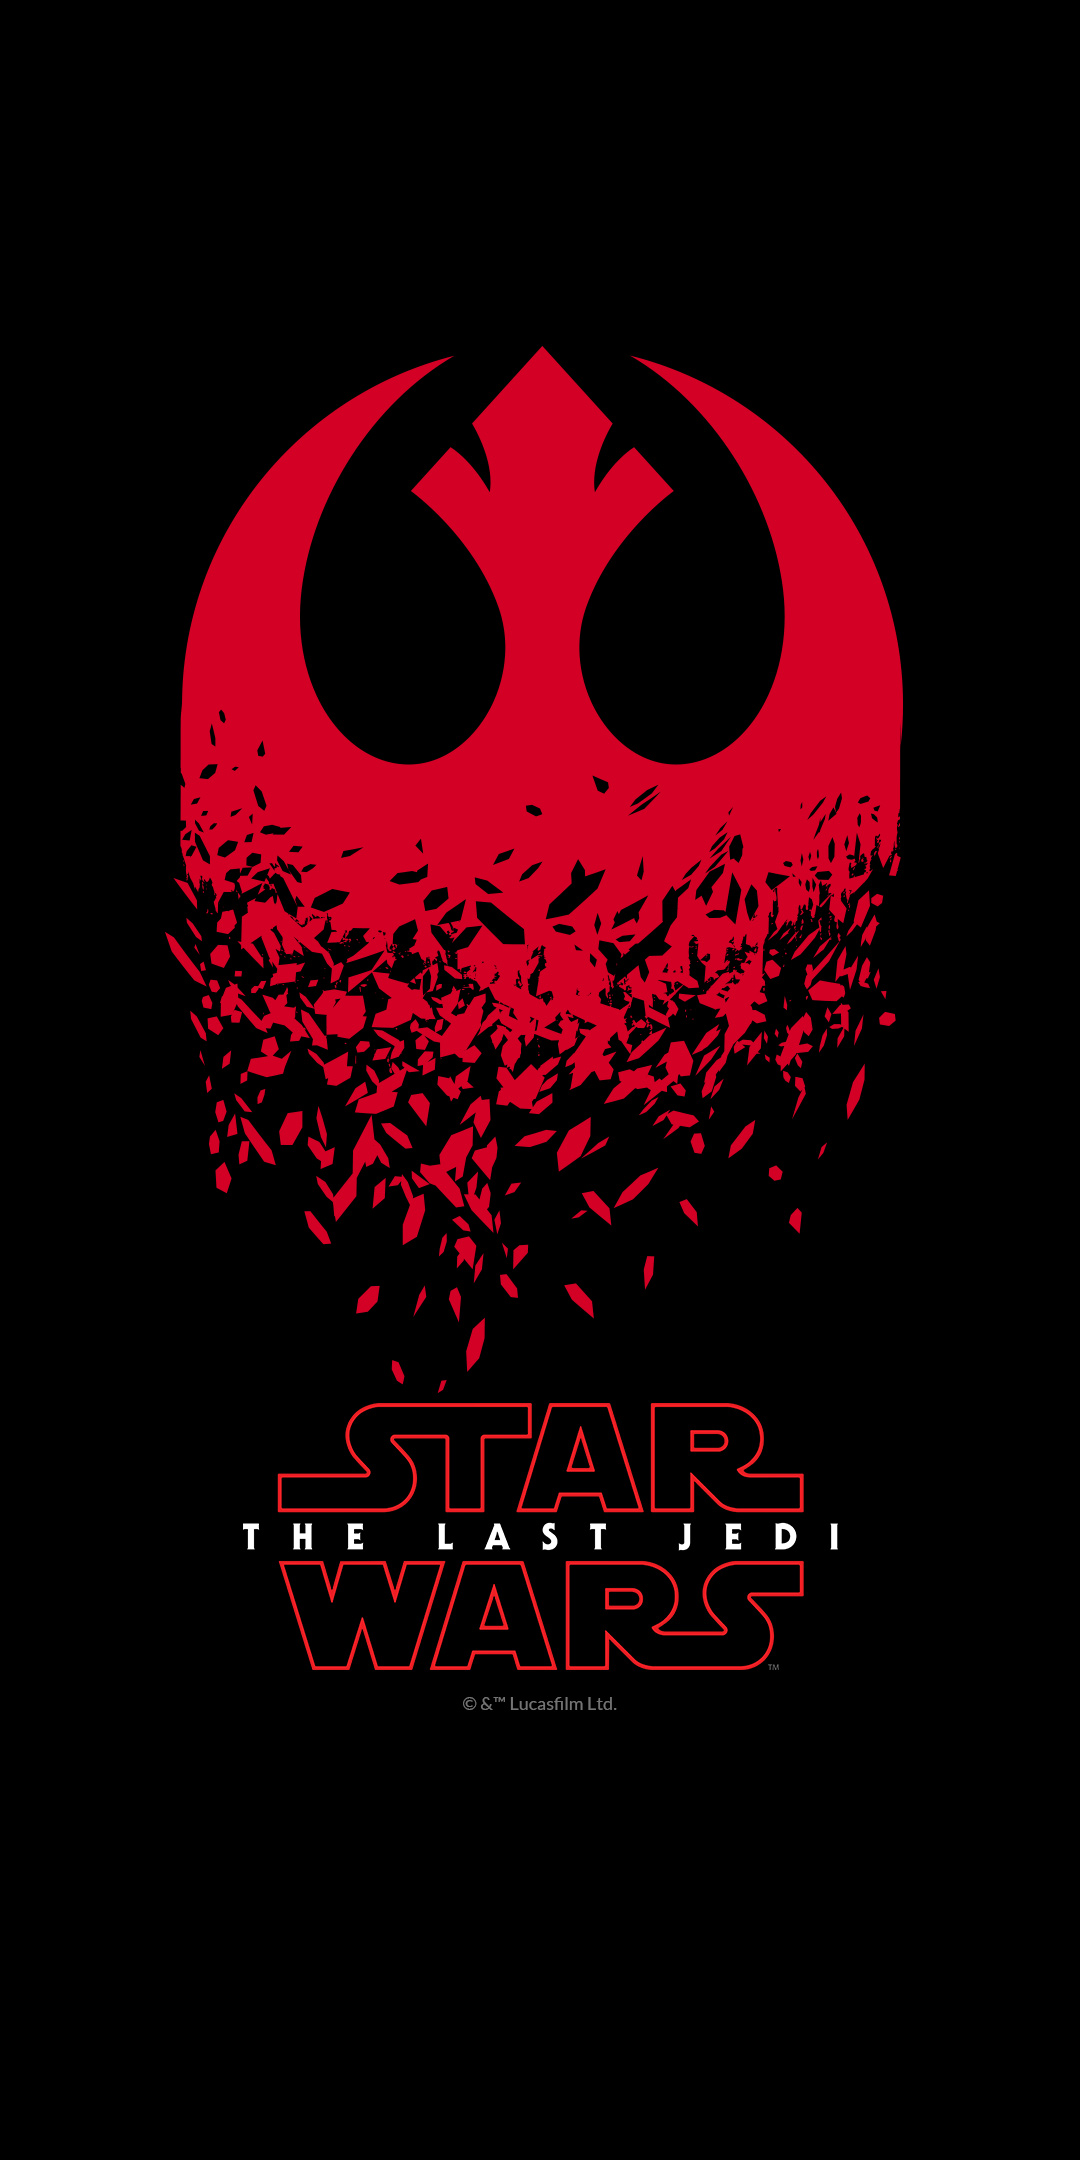 OnePlus 5T Star Wars The Last Jedi wallpapers download